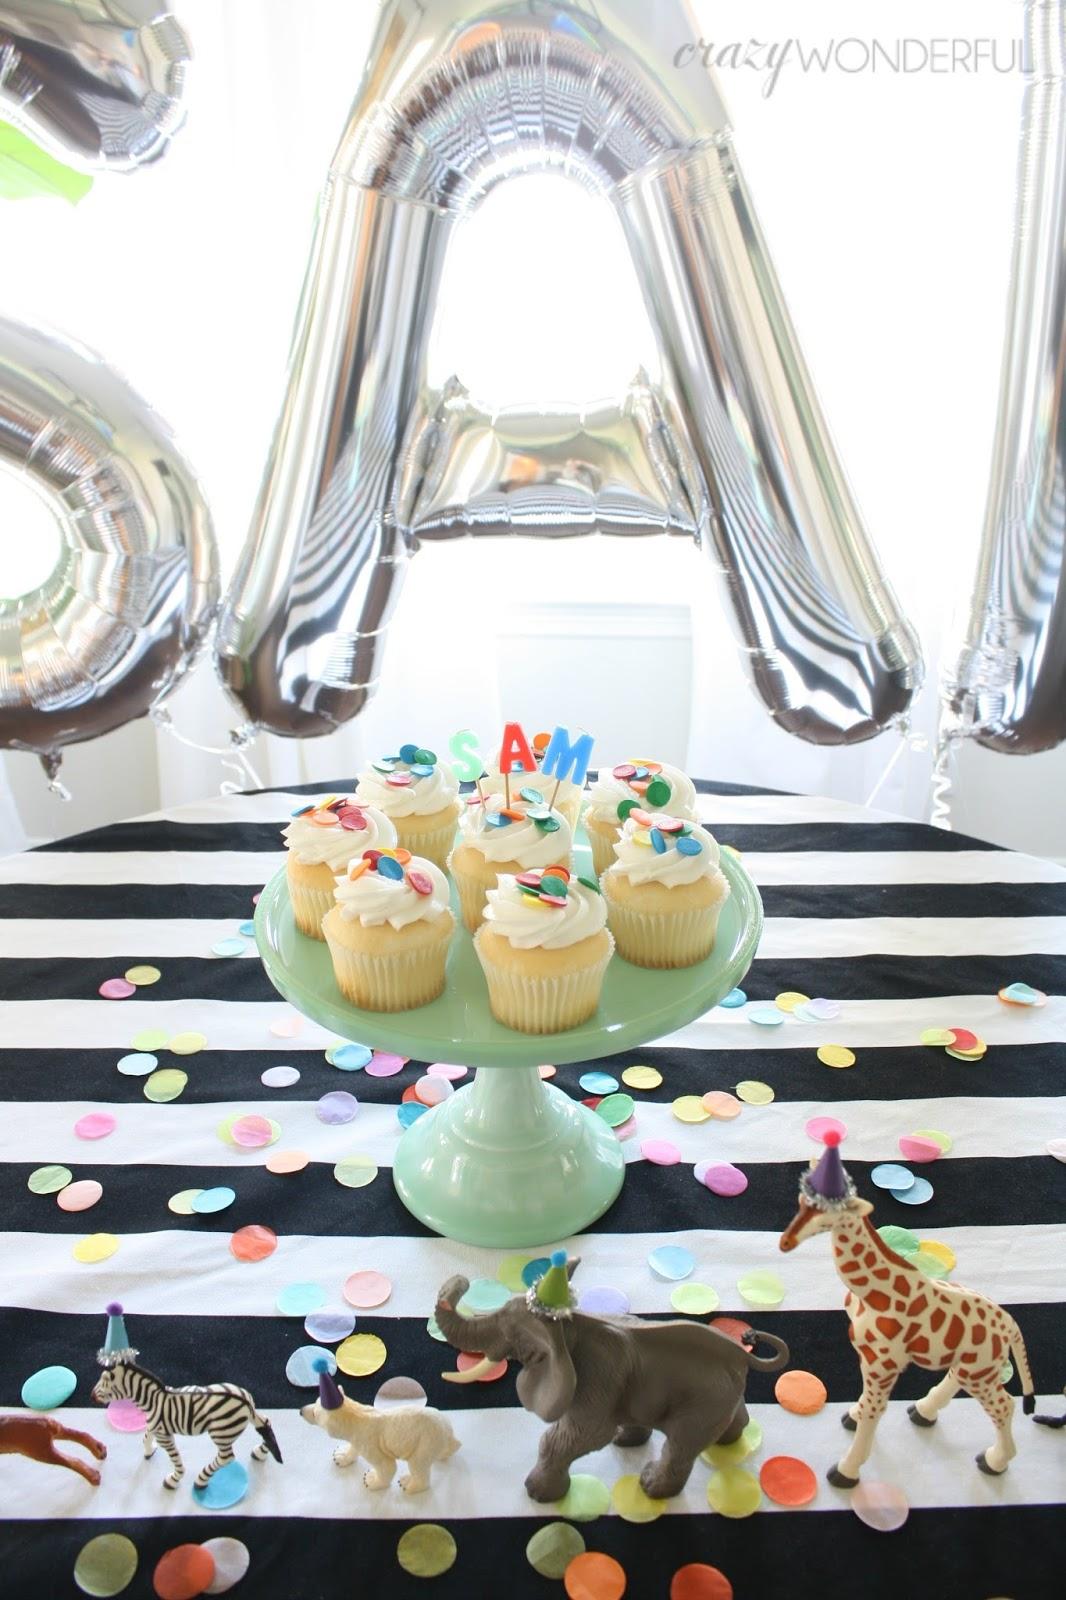 samuel\'s 3rd birthday party - Crazy Wonderful